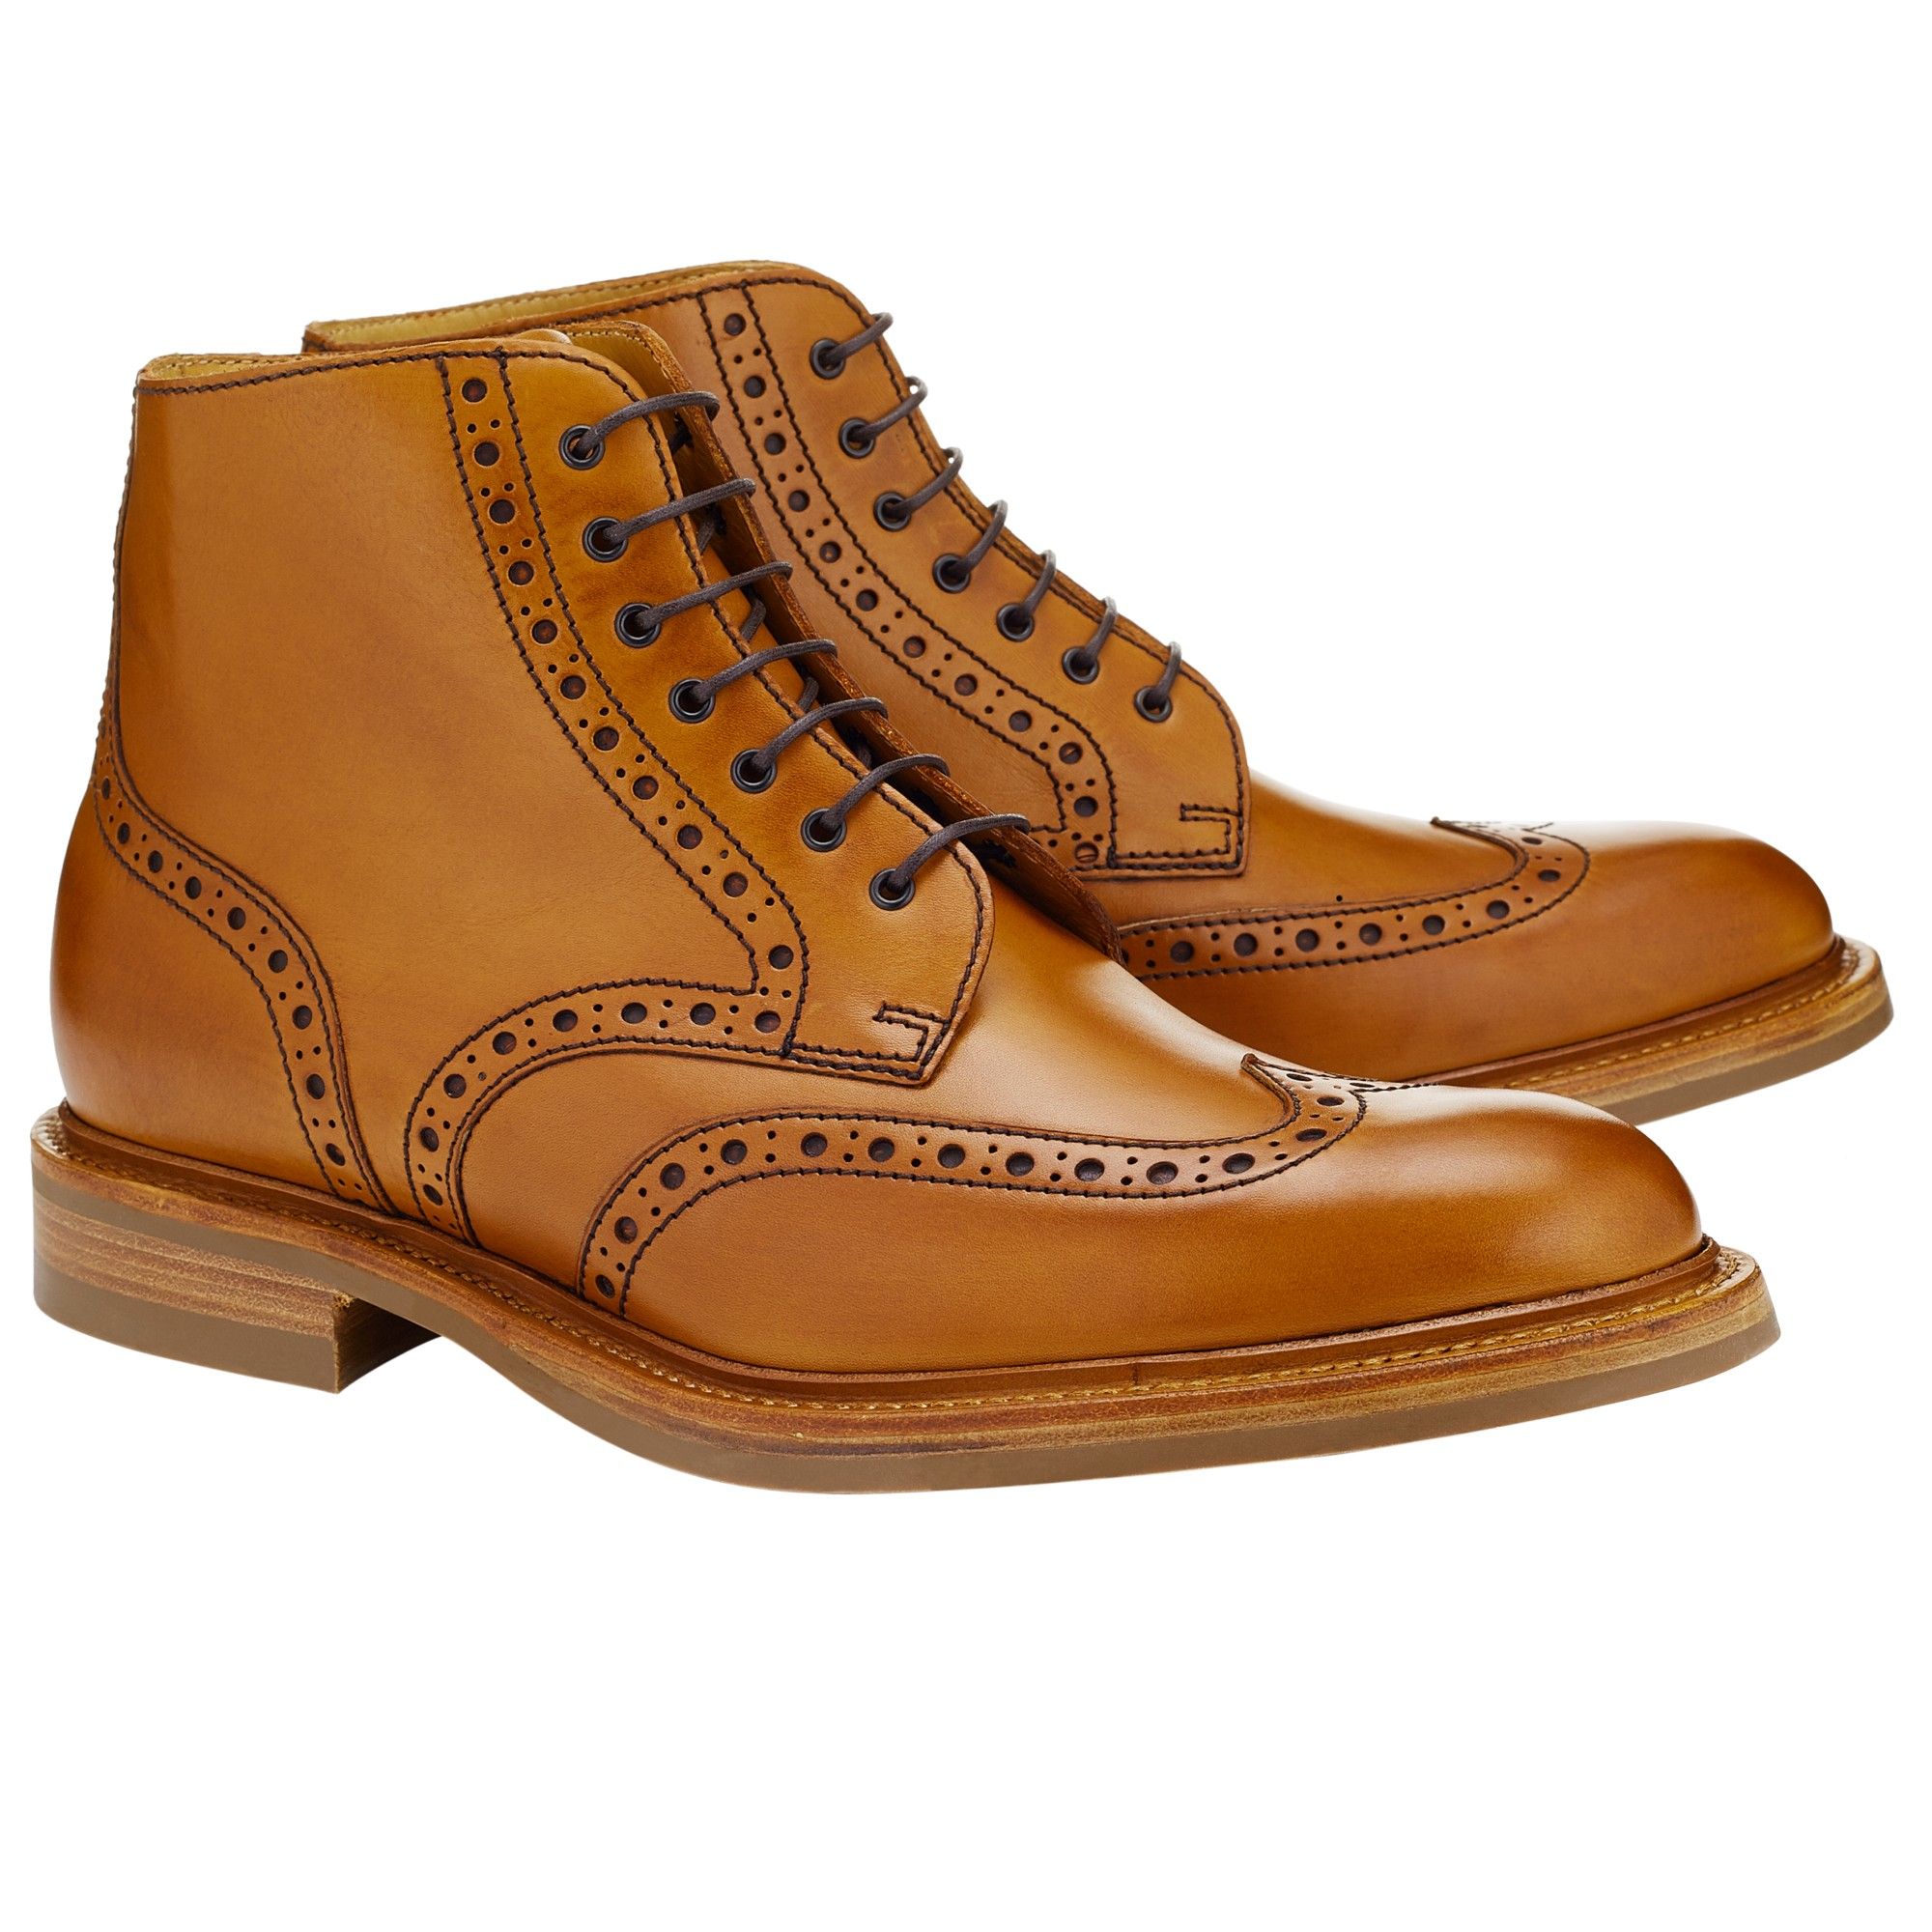 Cheap Timberland Deck Shoes